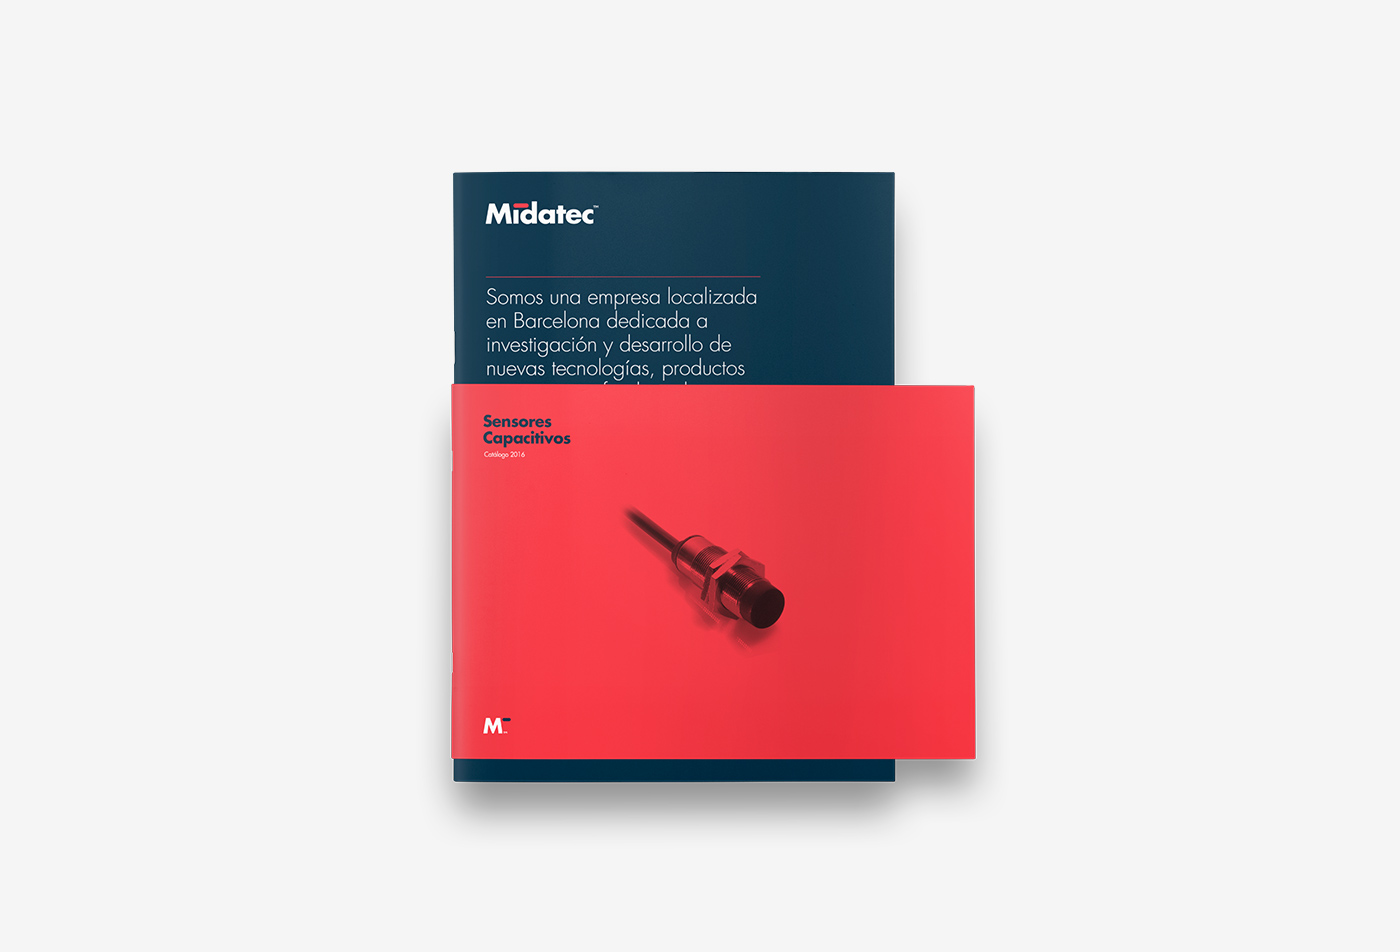 pixelarte-estudio-diseno-grafico-dossier-para-Midatec